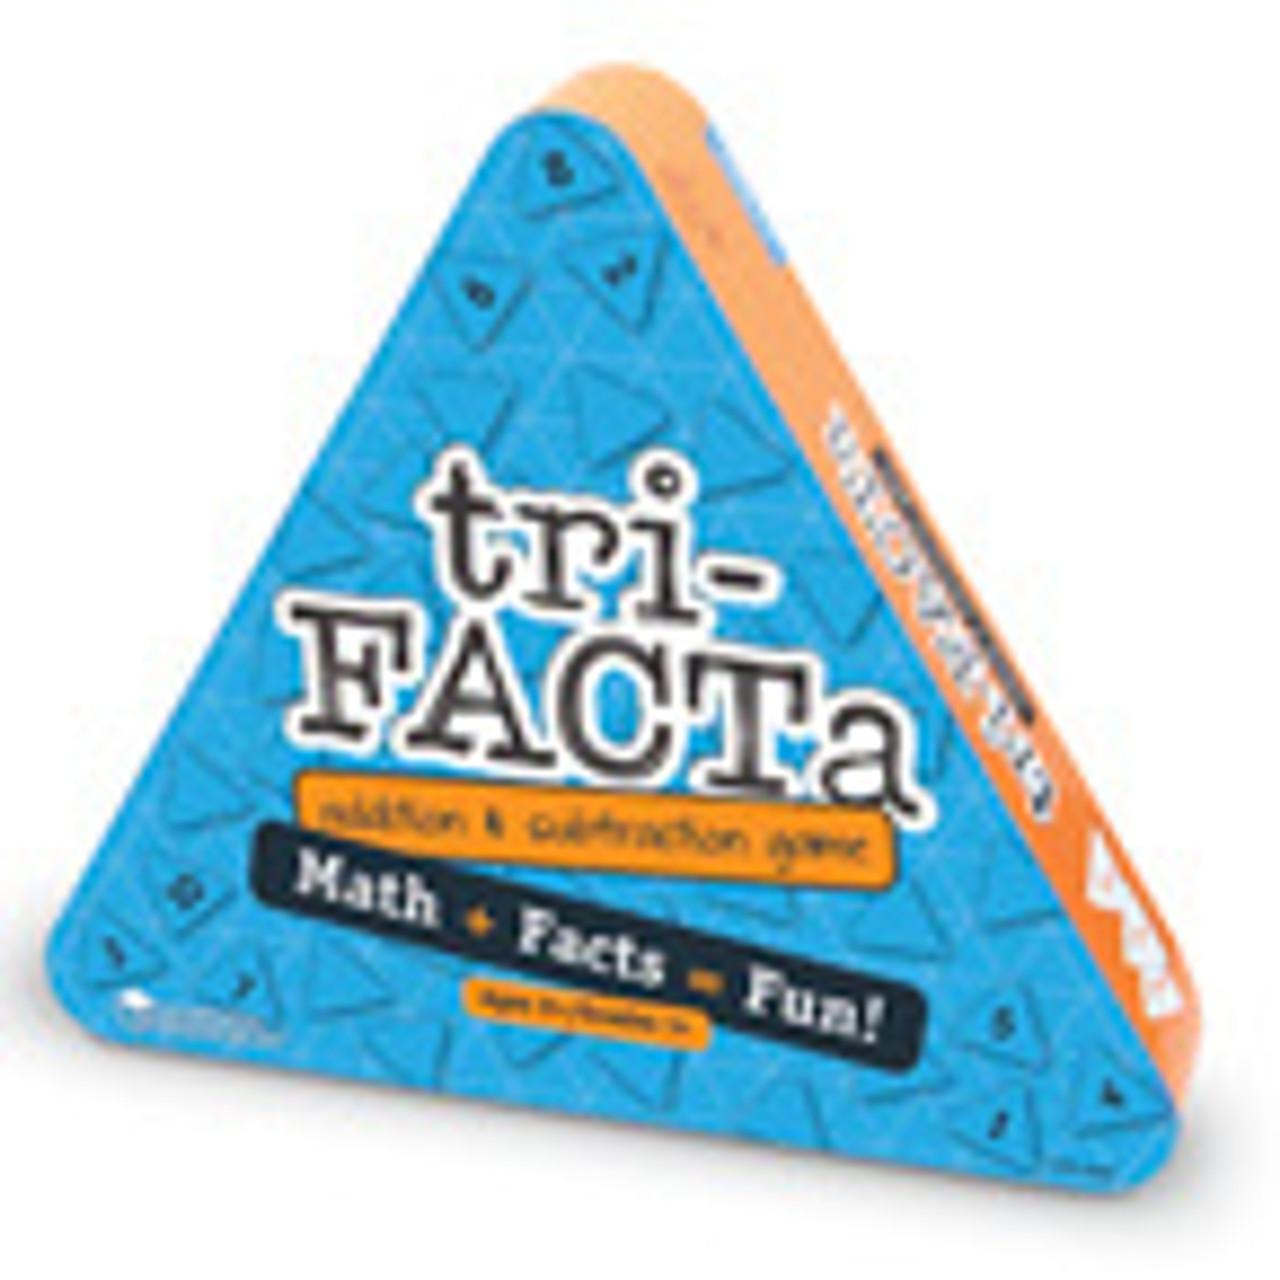 Tri-Facta Addition & Subtraction Game